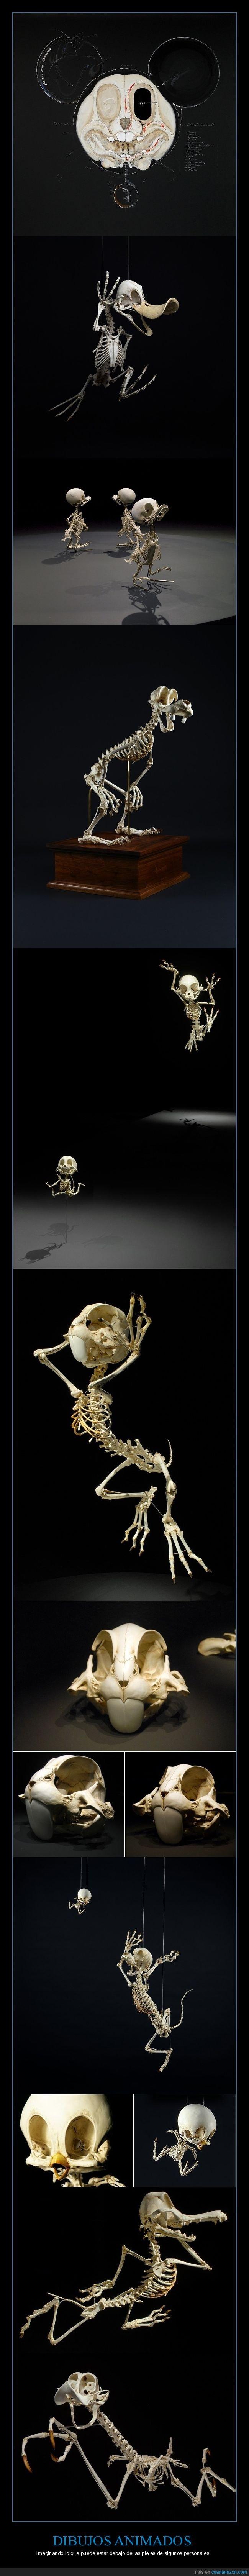 dibujos animados,esqueletos,personajes